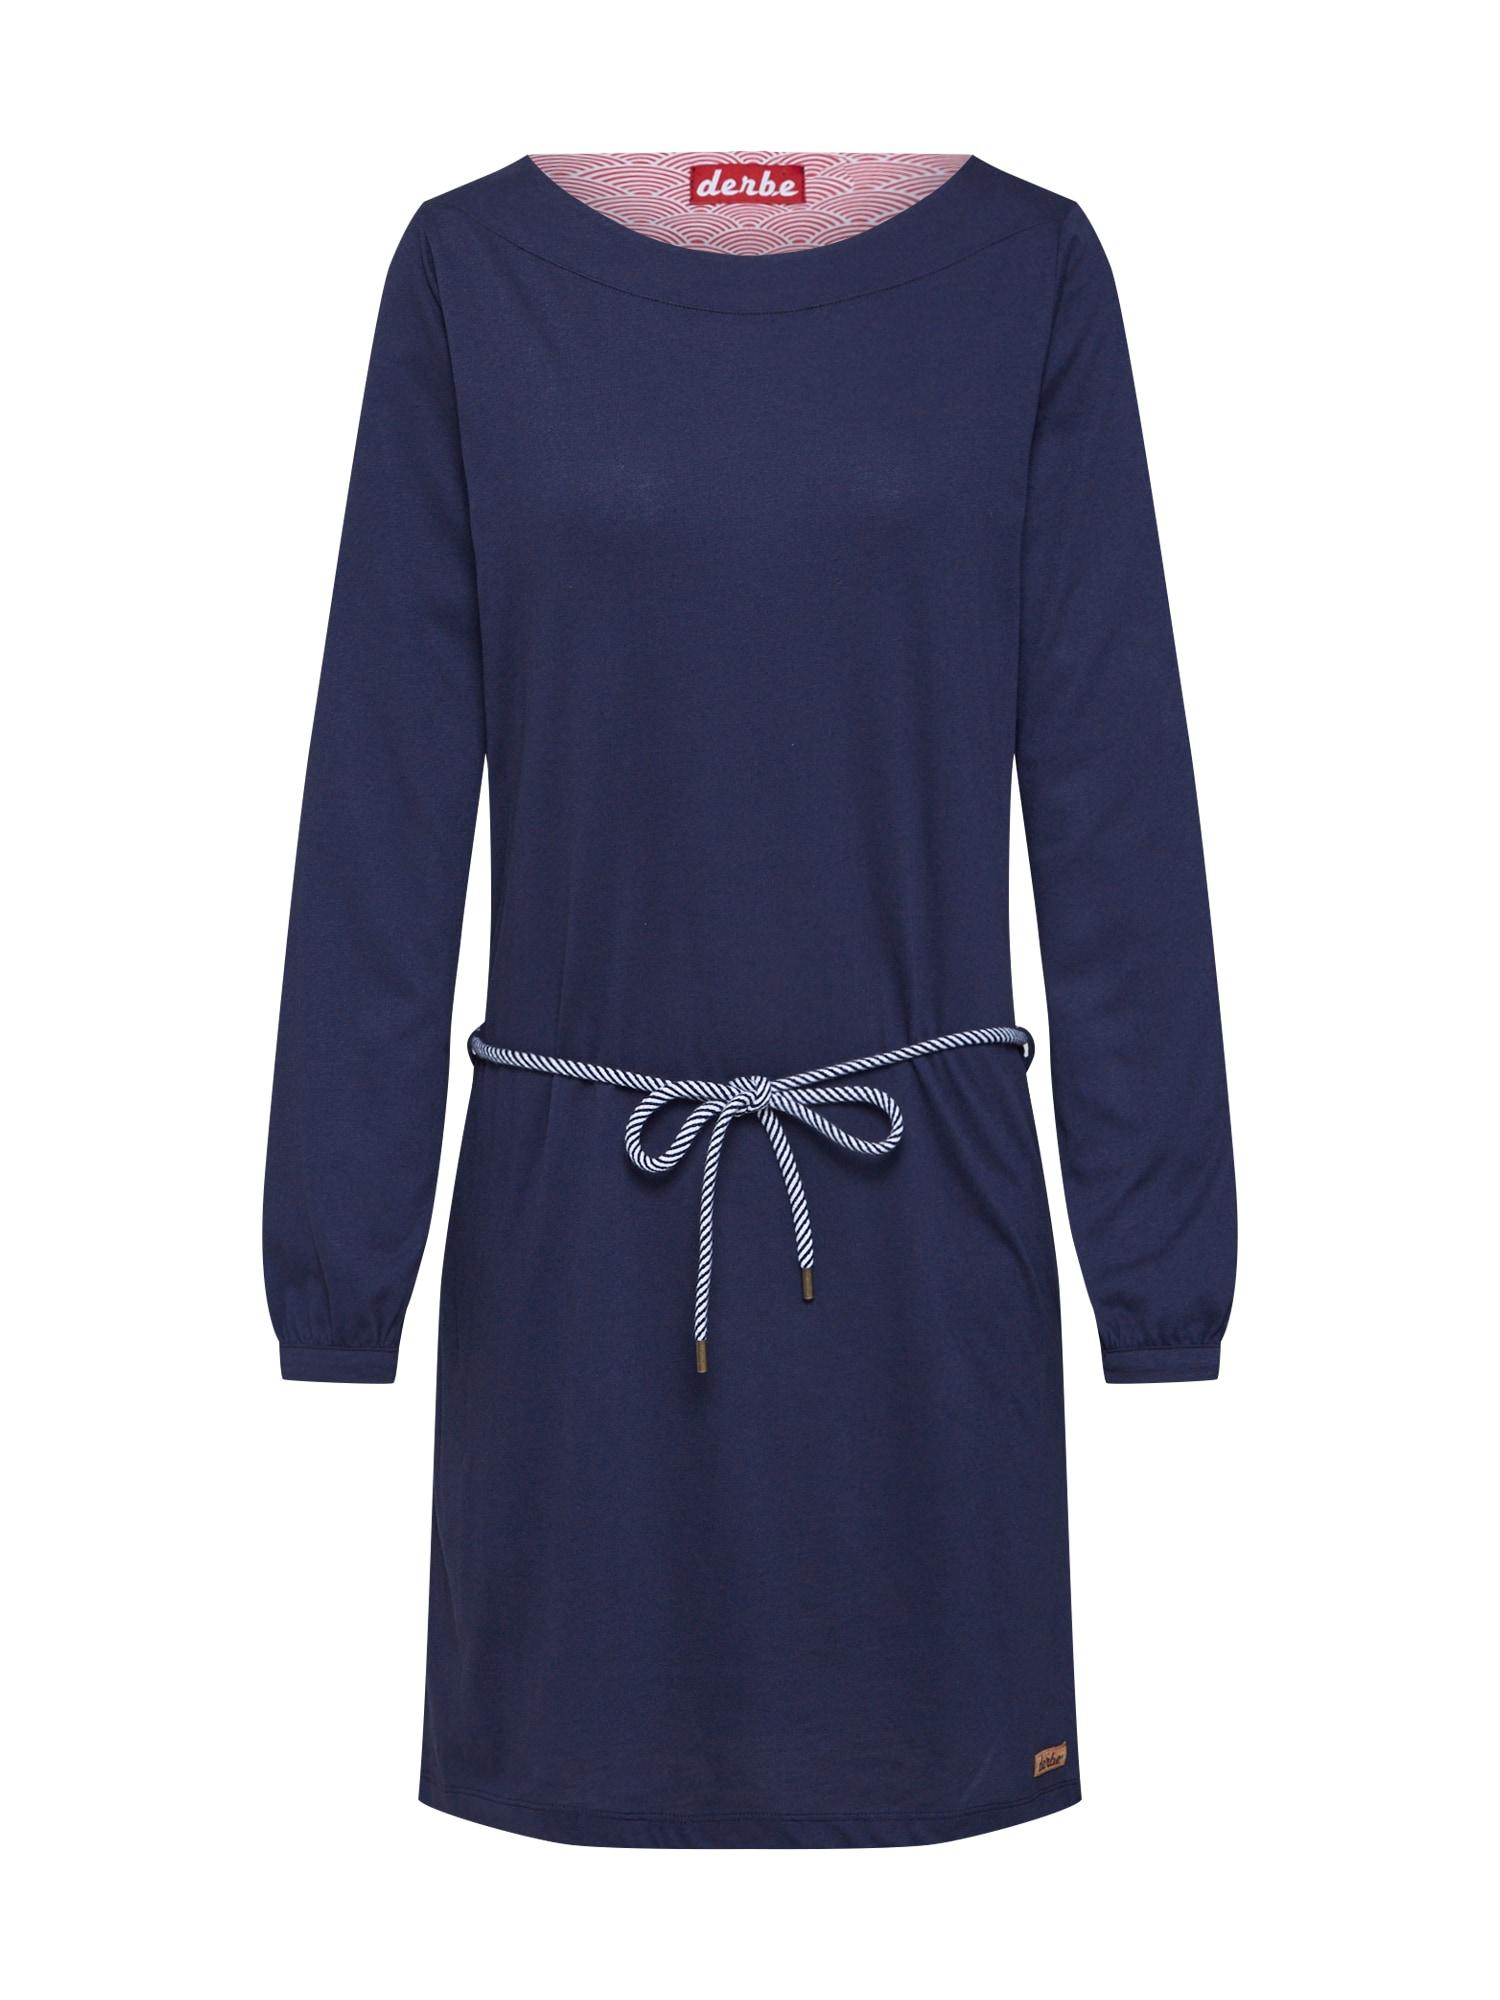 Derbe Suknelė 'Marilyn DRESS' tamsiai mėlyna